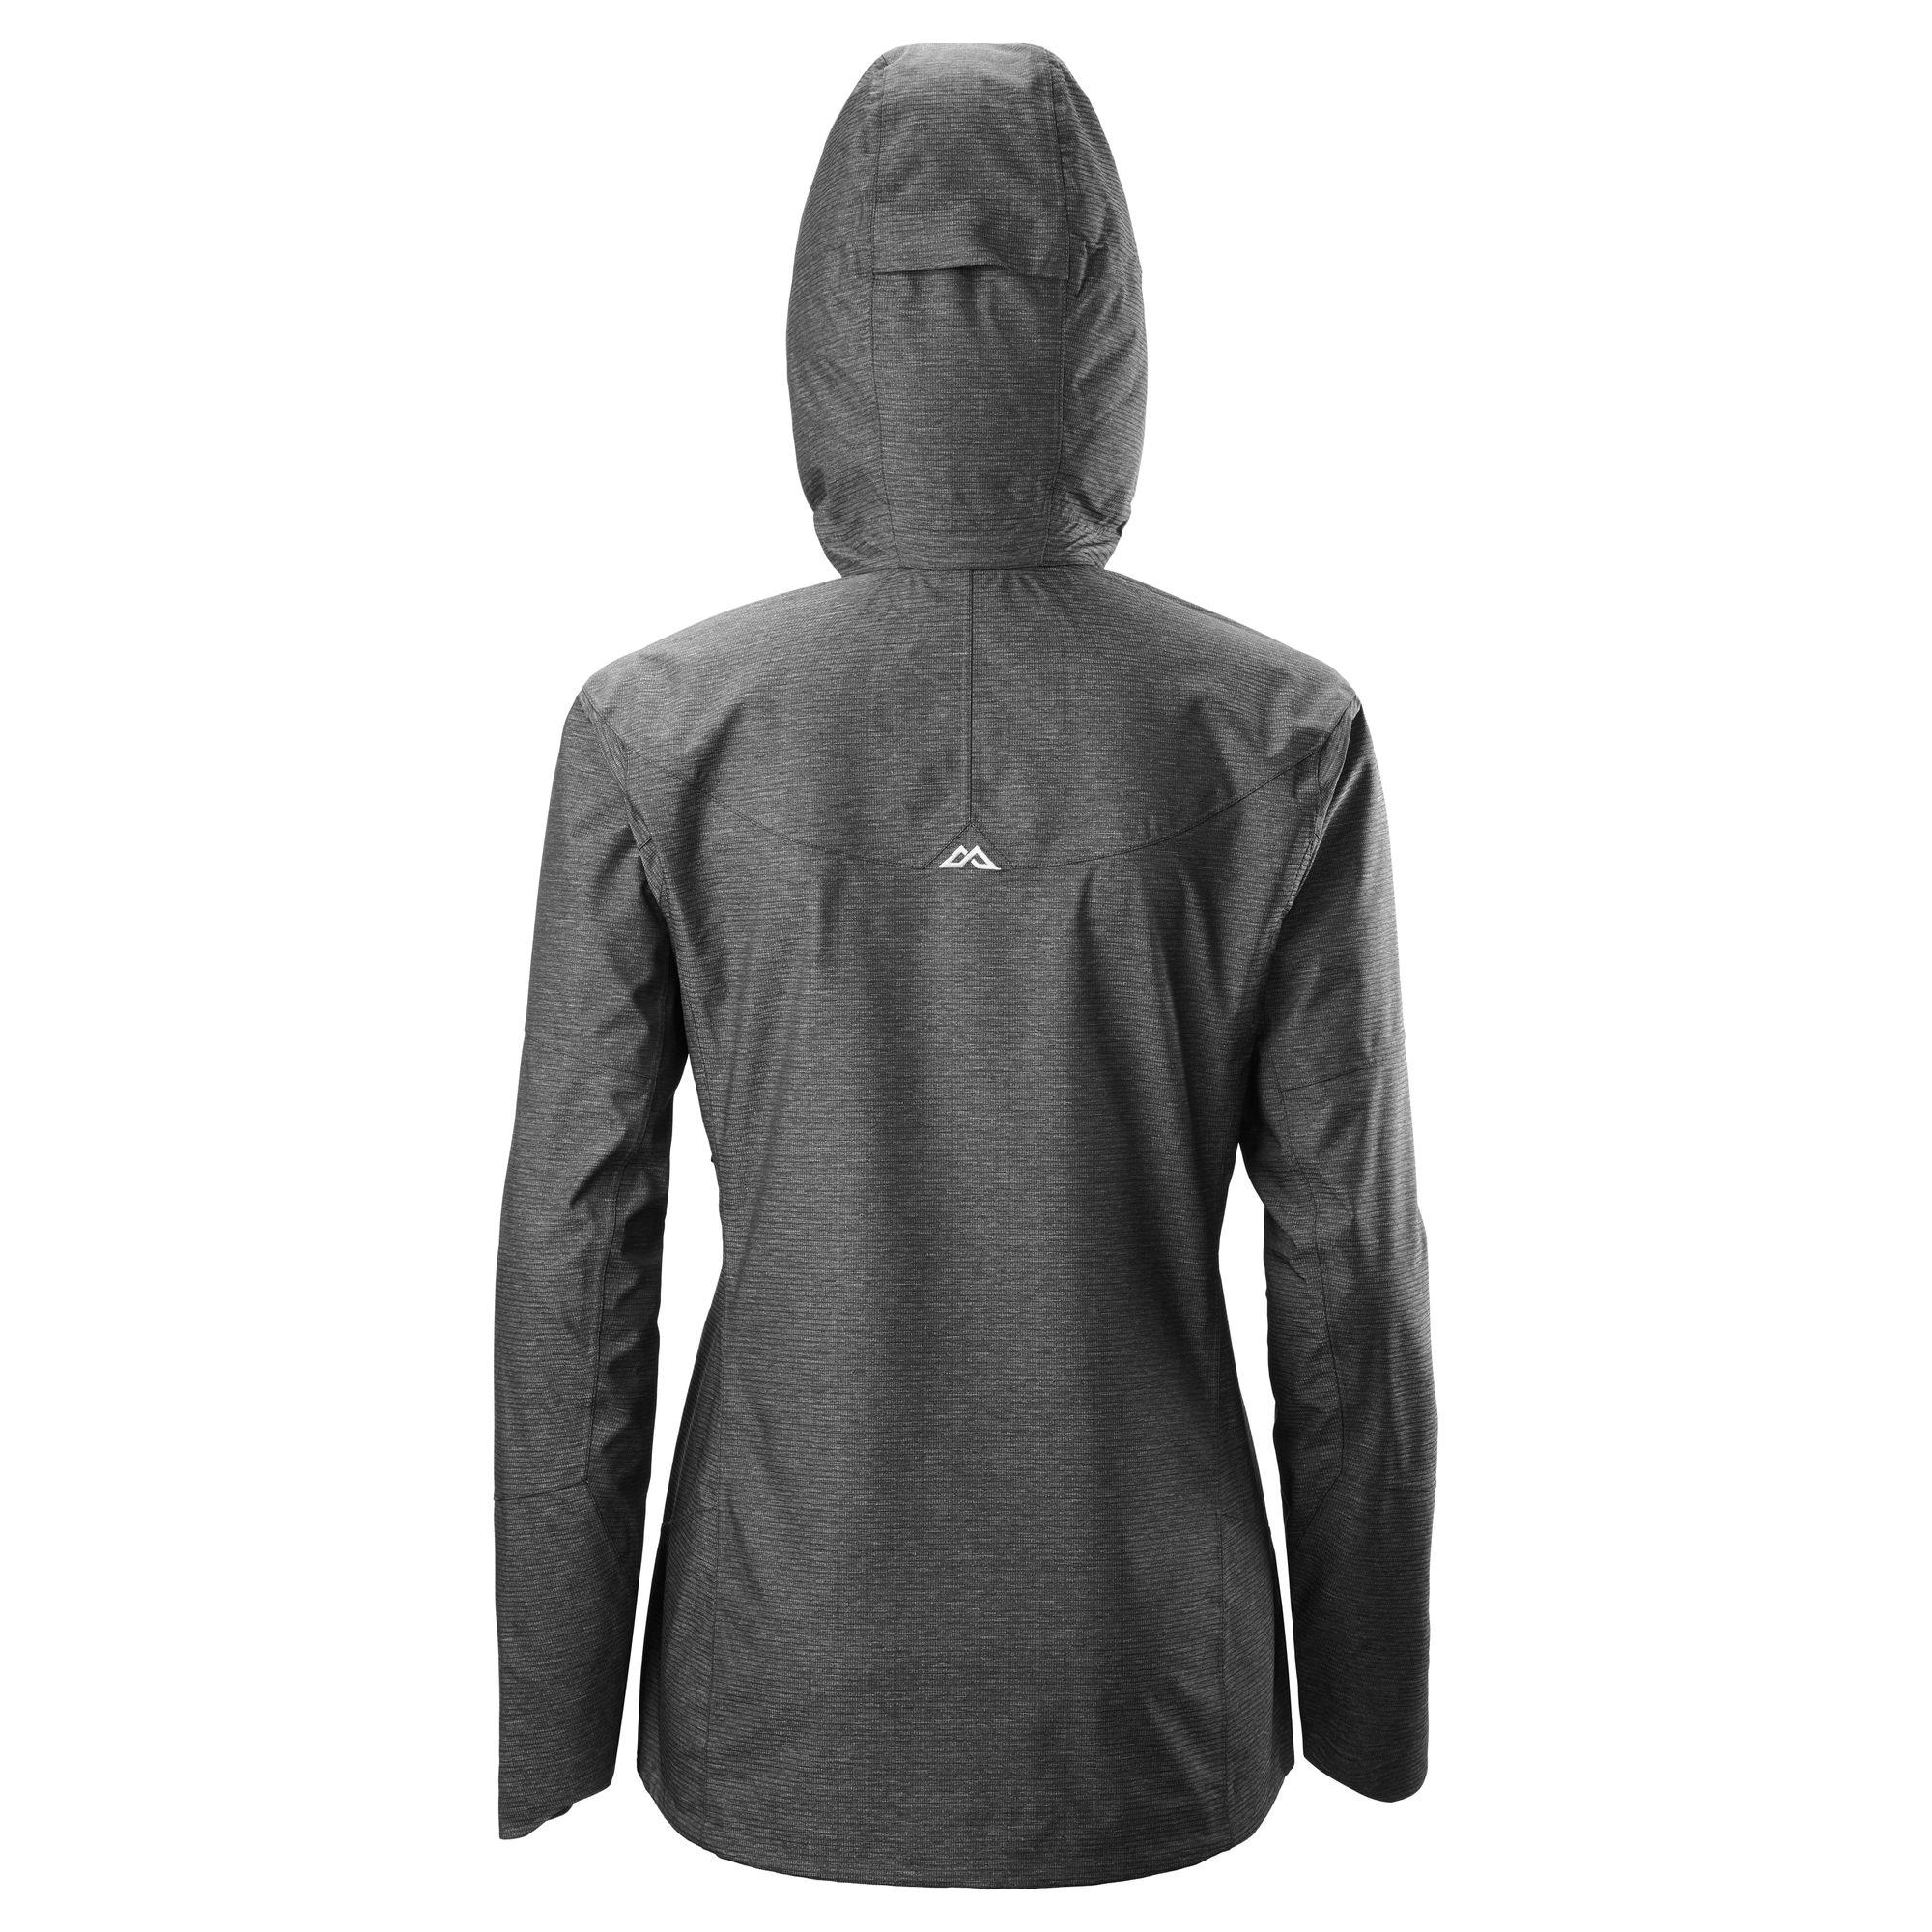 NEW-Kathmandu-Lawrence-Women-039-s-ngx-Windproof-Waterproof-Outdoor-Rain-Jacket-v2 thumbnail 8